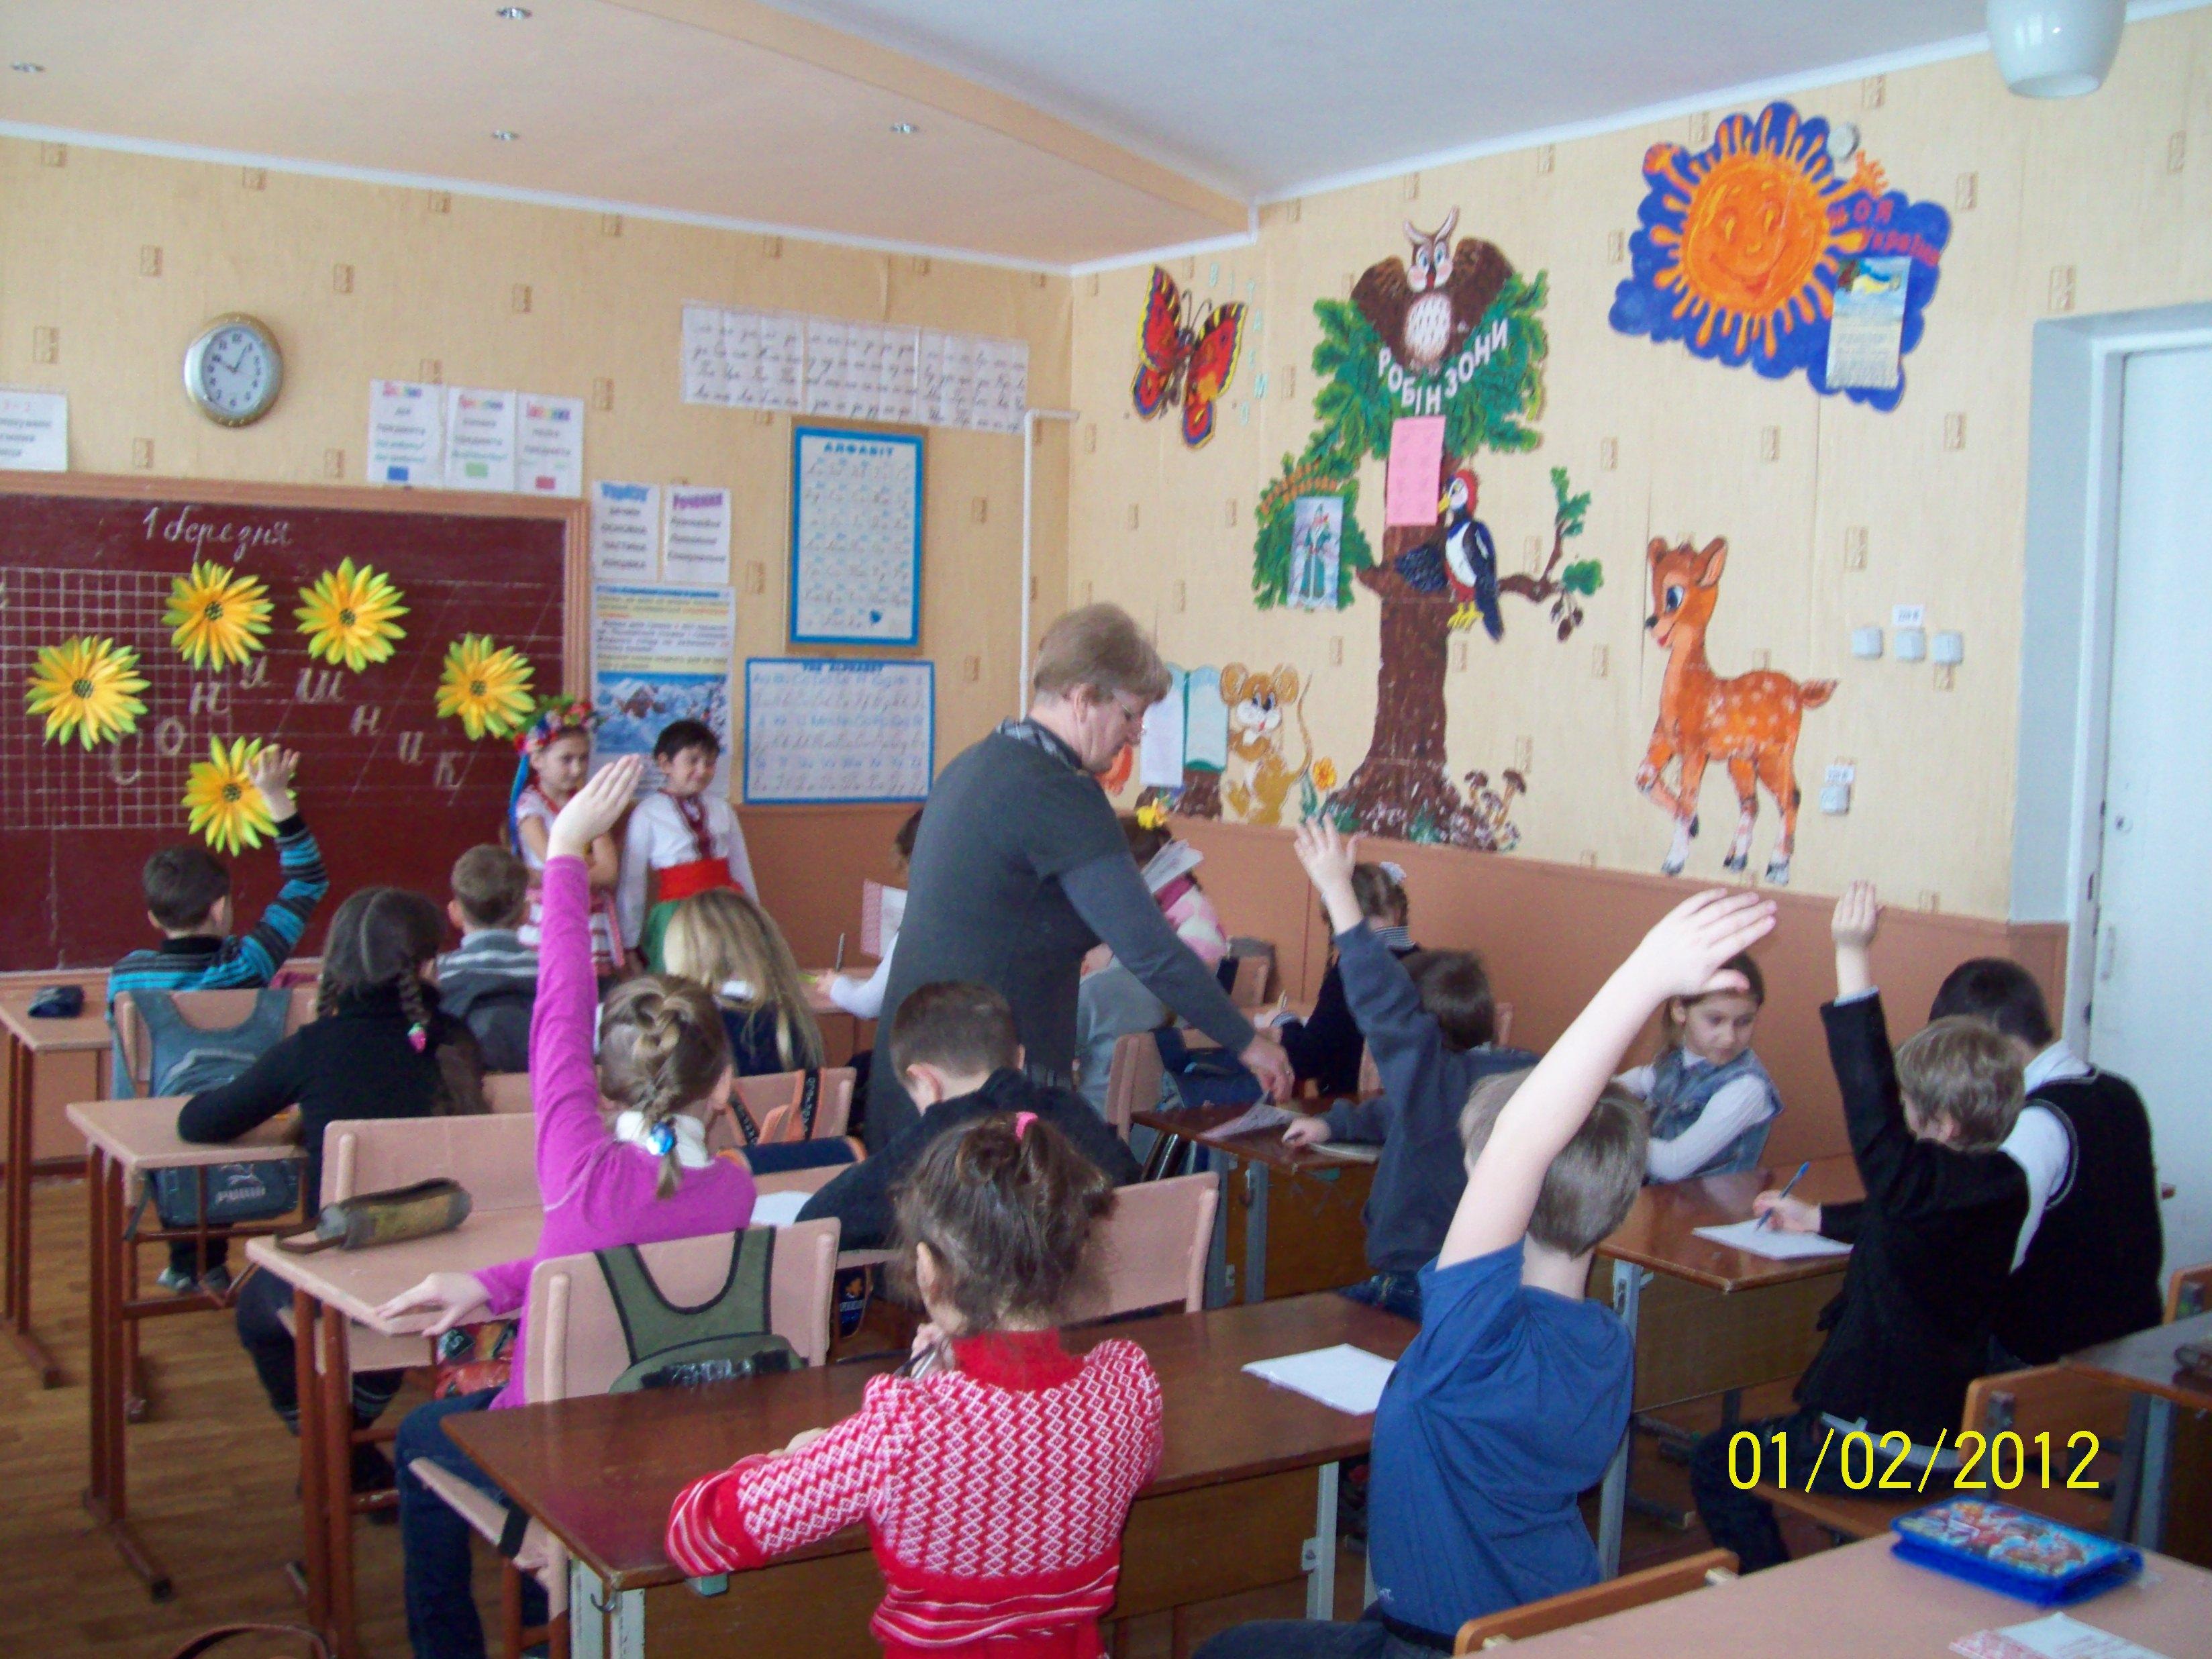 http://school4apost.dnepredu.com/uploads/editor/1500/91761/sitepage_20/101_0265.jpg